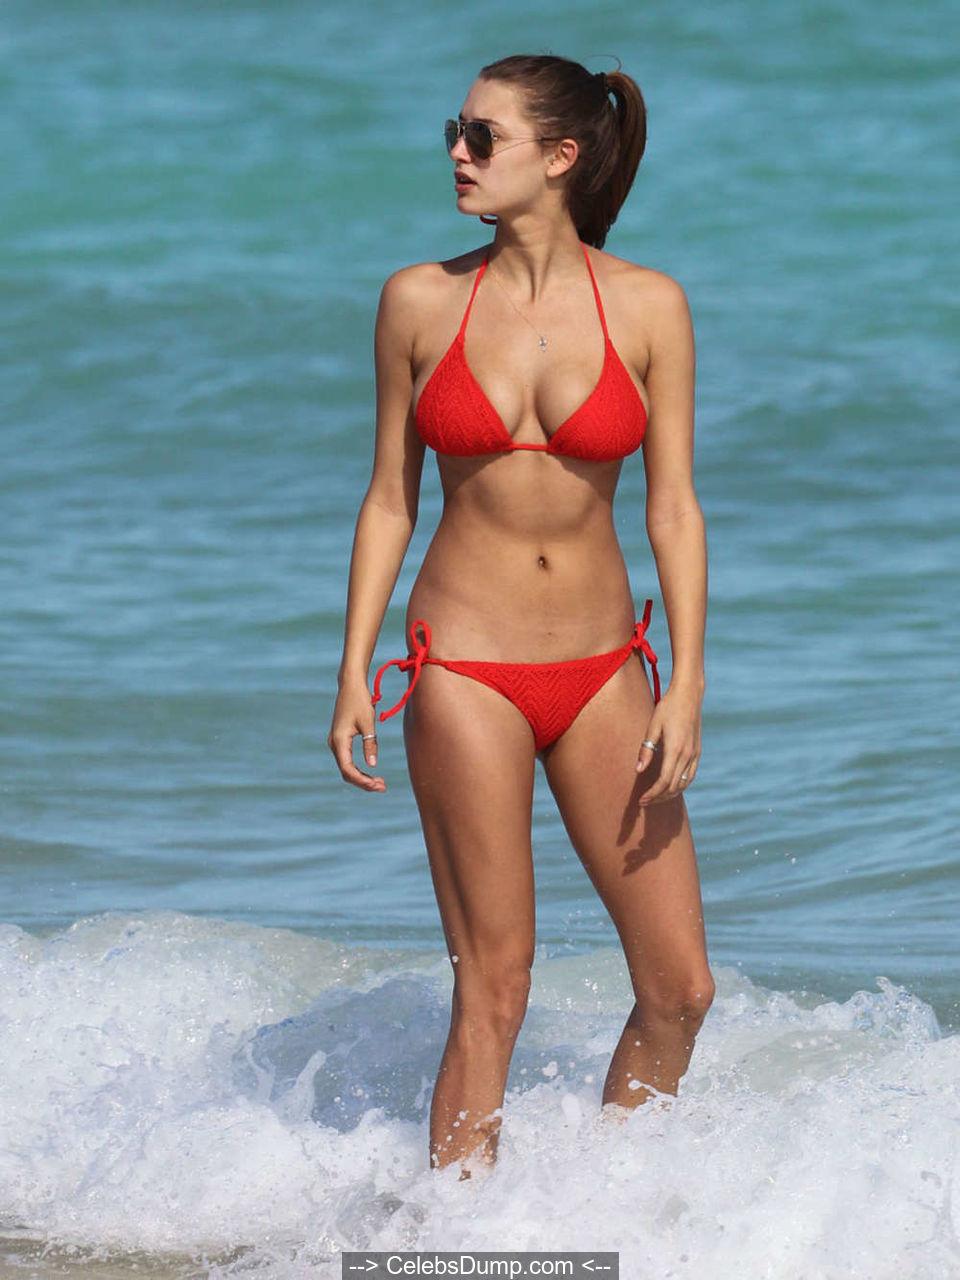 Alyssa Arce Movies alyssa arce sexy, topless & nude photos & movies | celebs dump